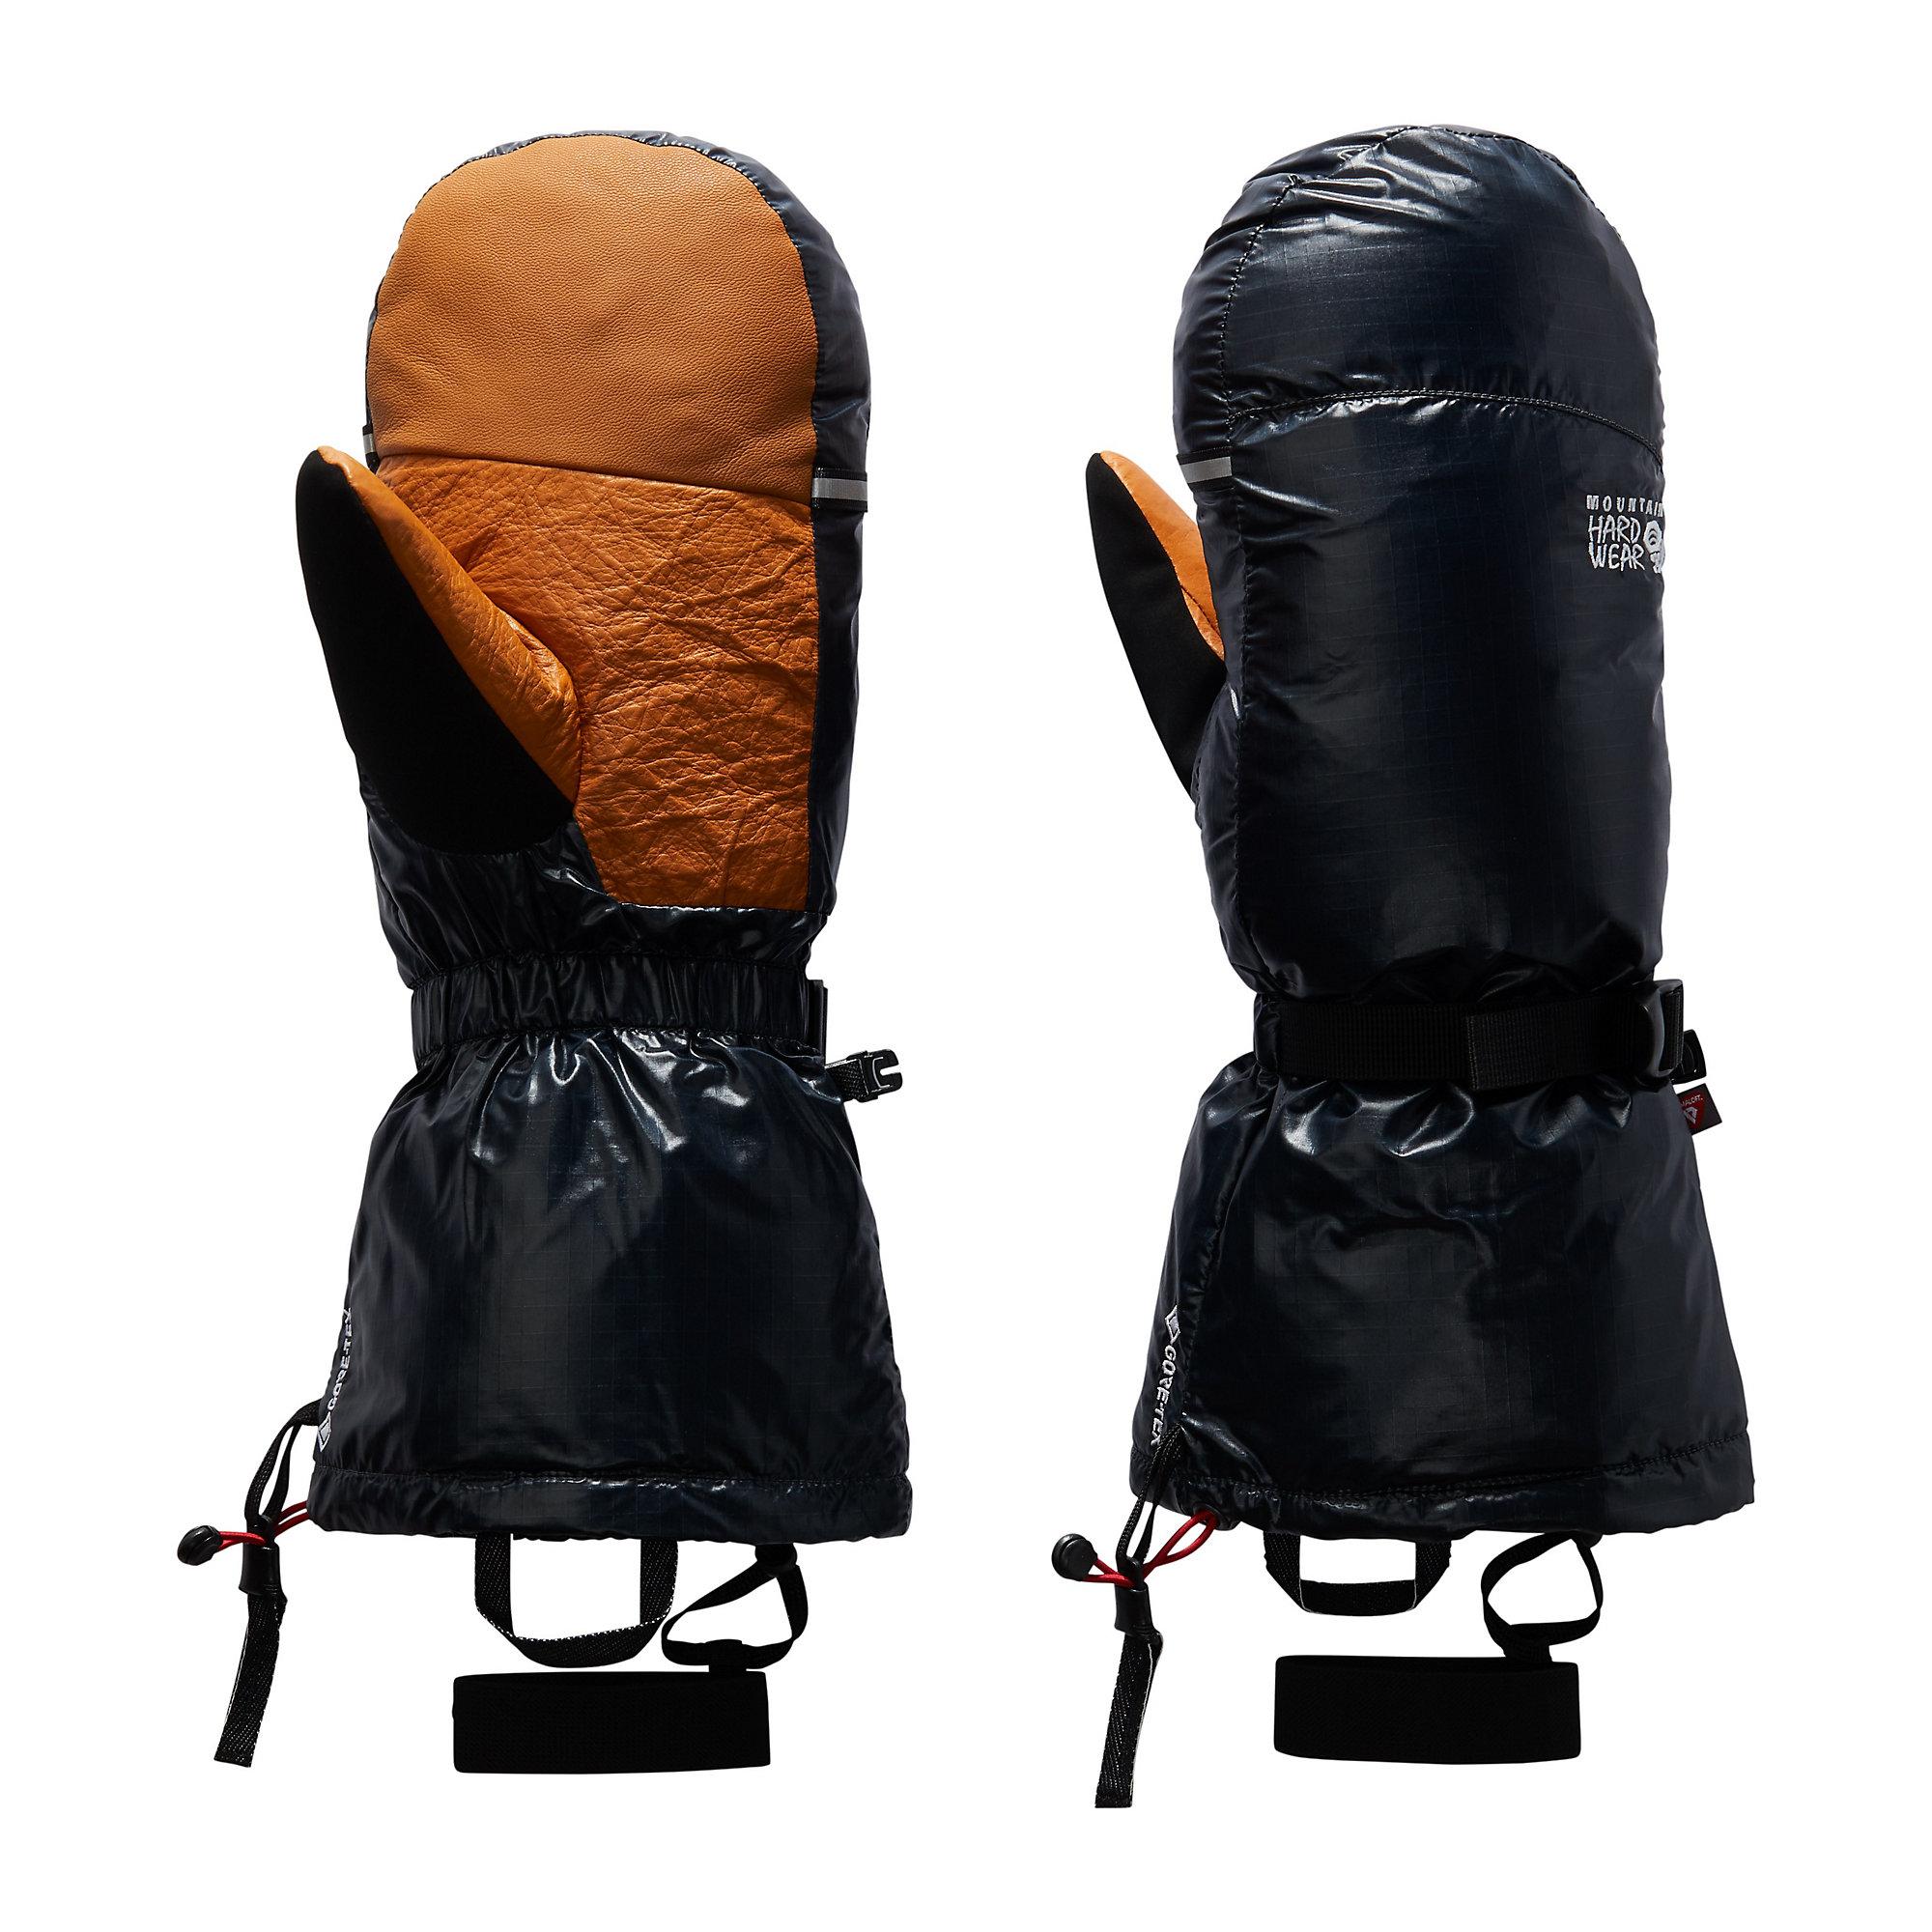 Mountain Hardwear Absolute Zero Gore-Tex Down Mitt 004 L-